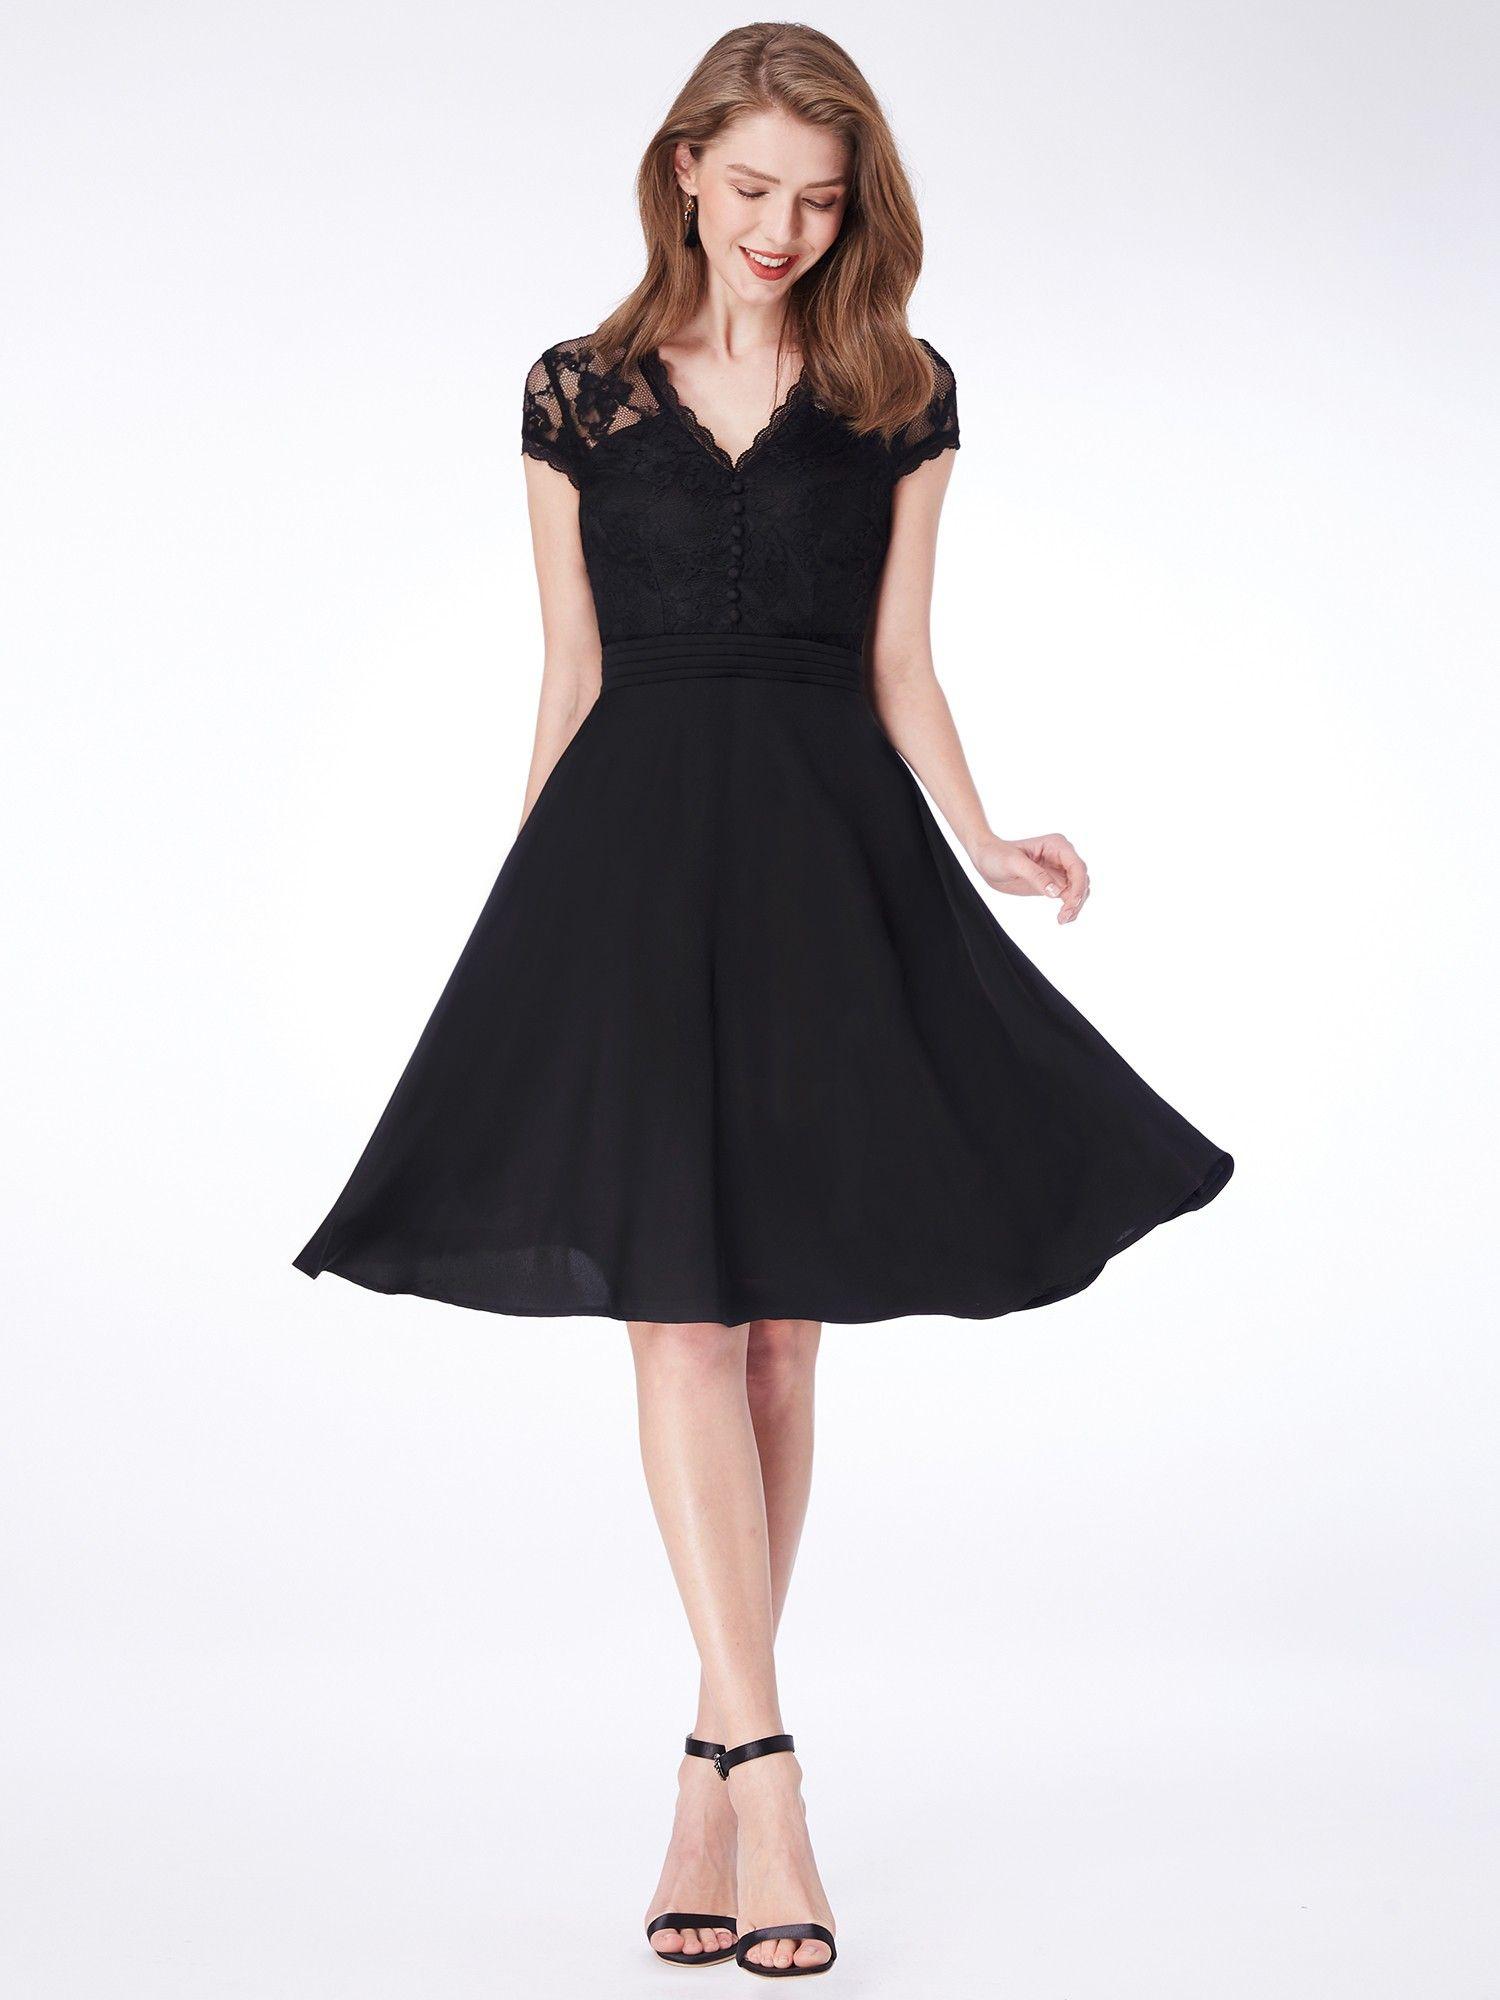 Alisa Pan Knee Length Cap Sleeve Little Black Dress Ever